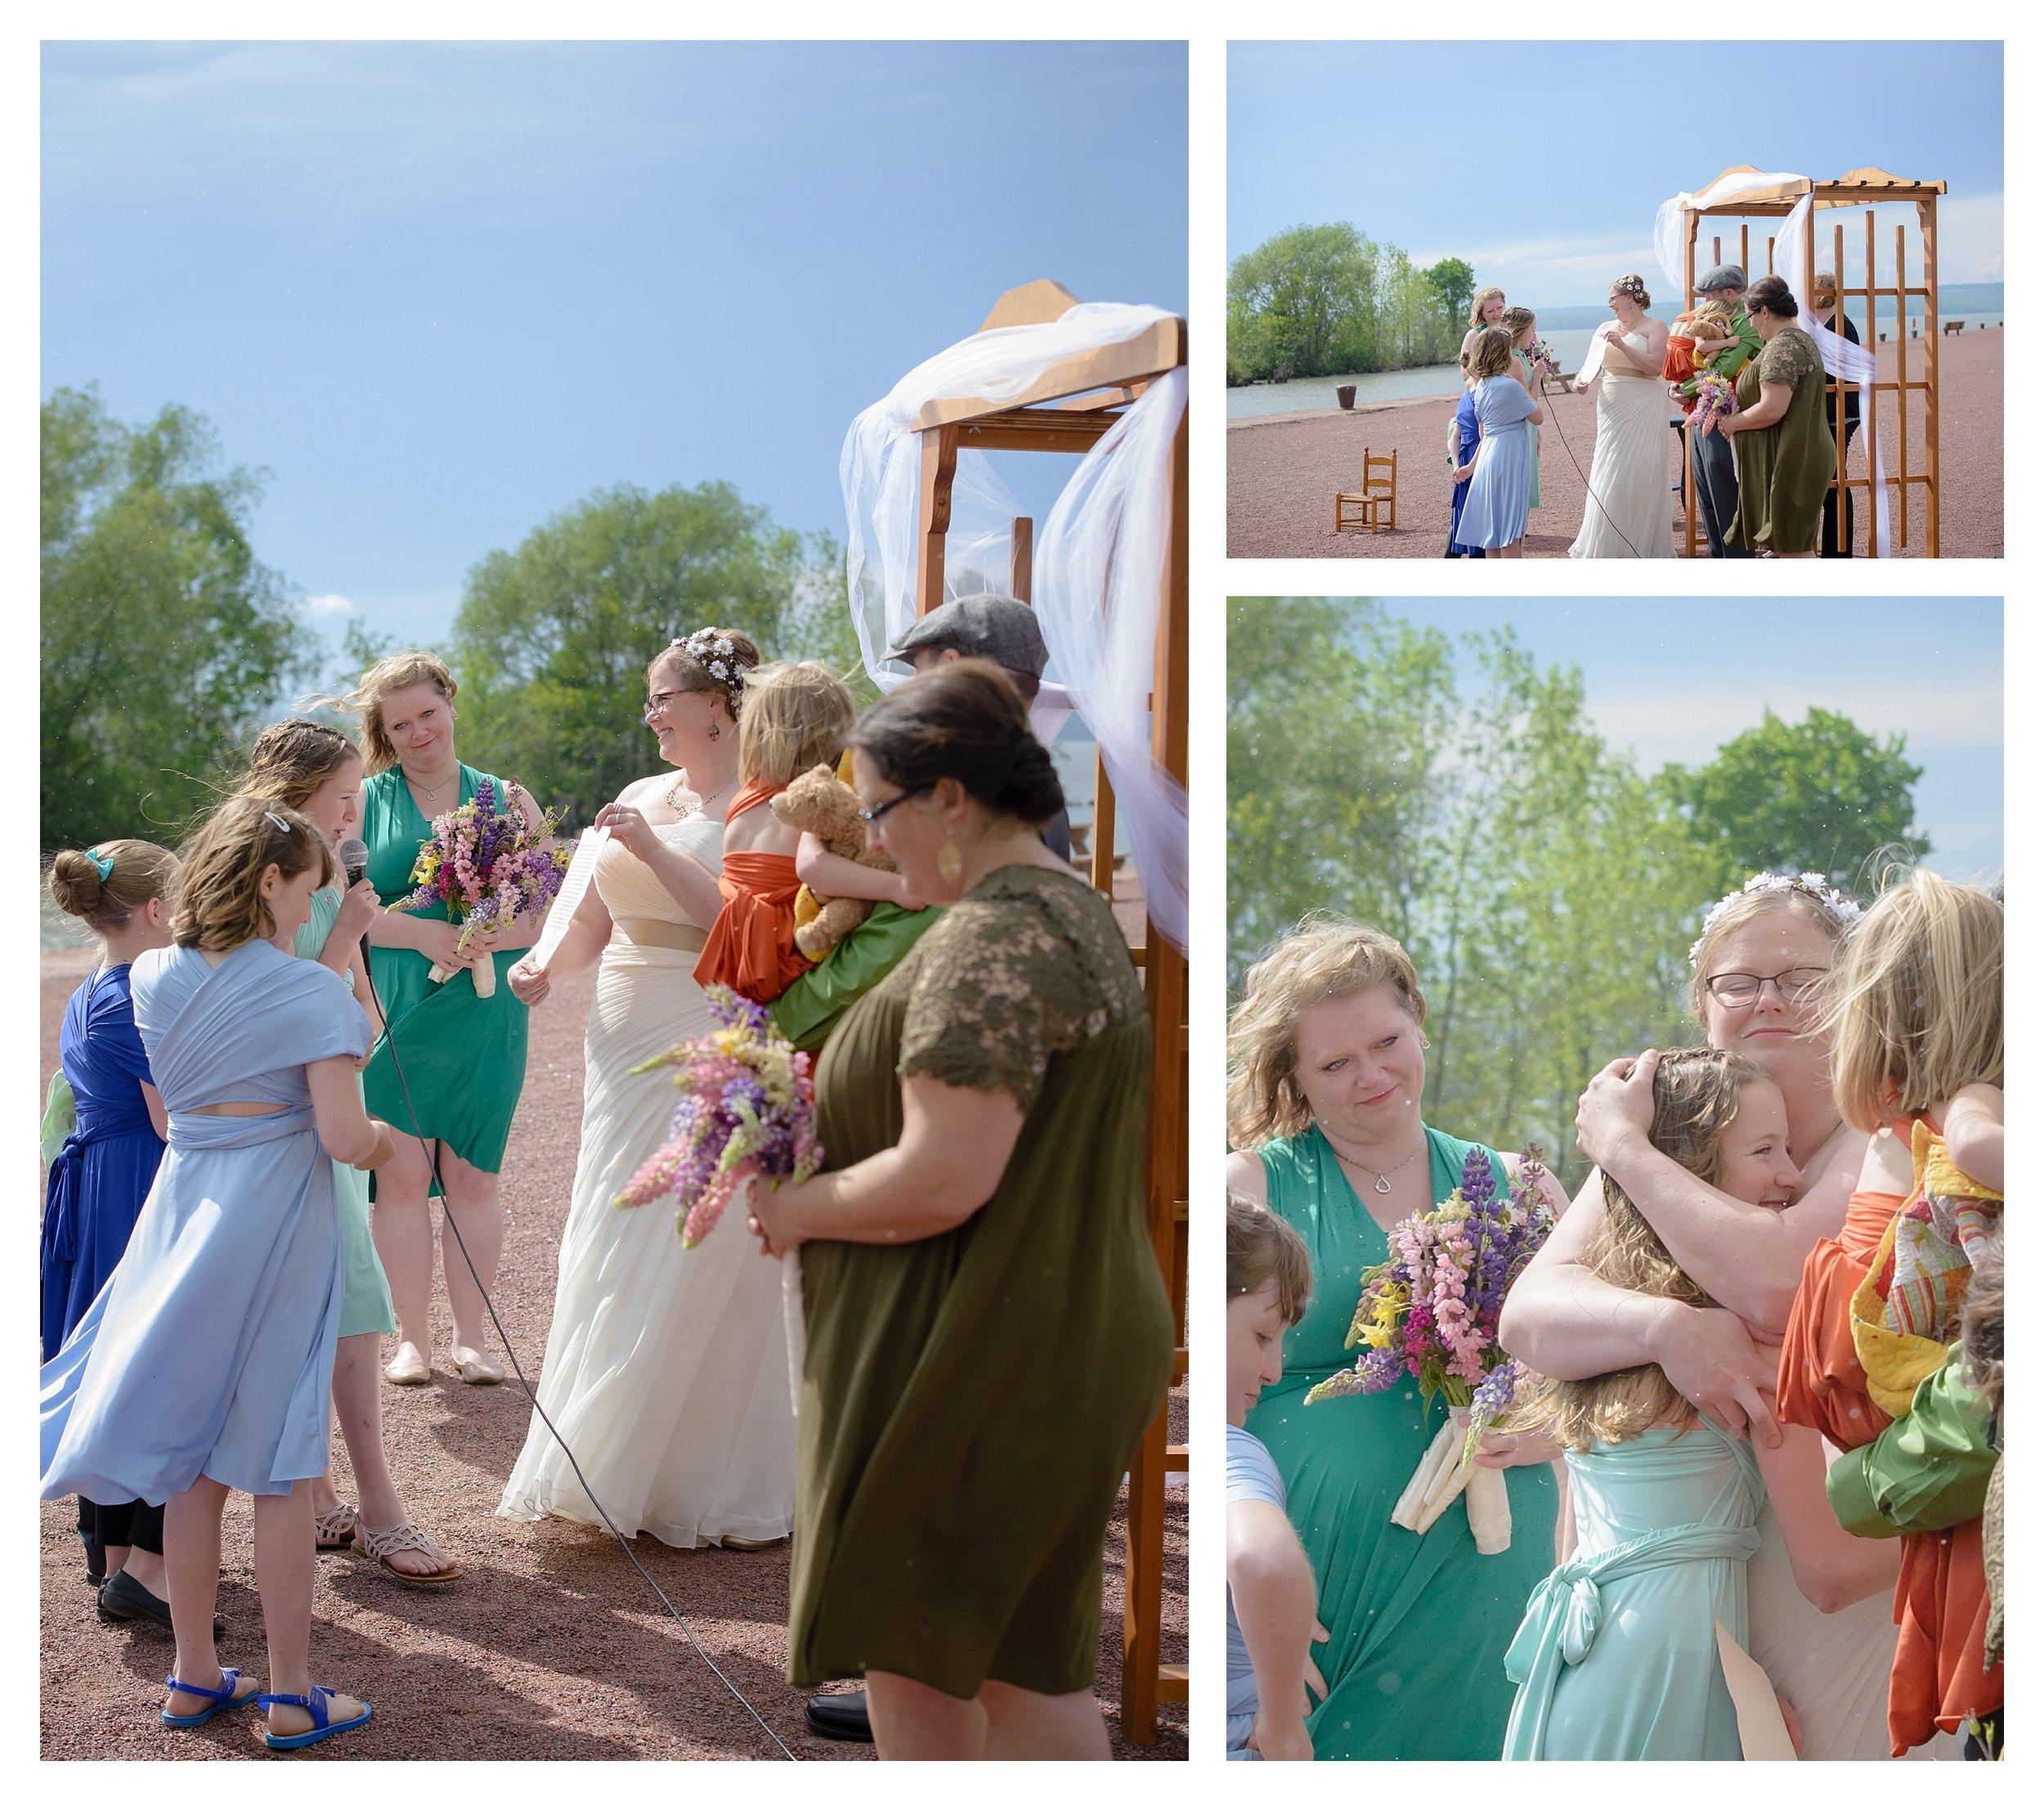 ashland oredock northwoods wisconsin wedding ps 139 photography_0288.jpg